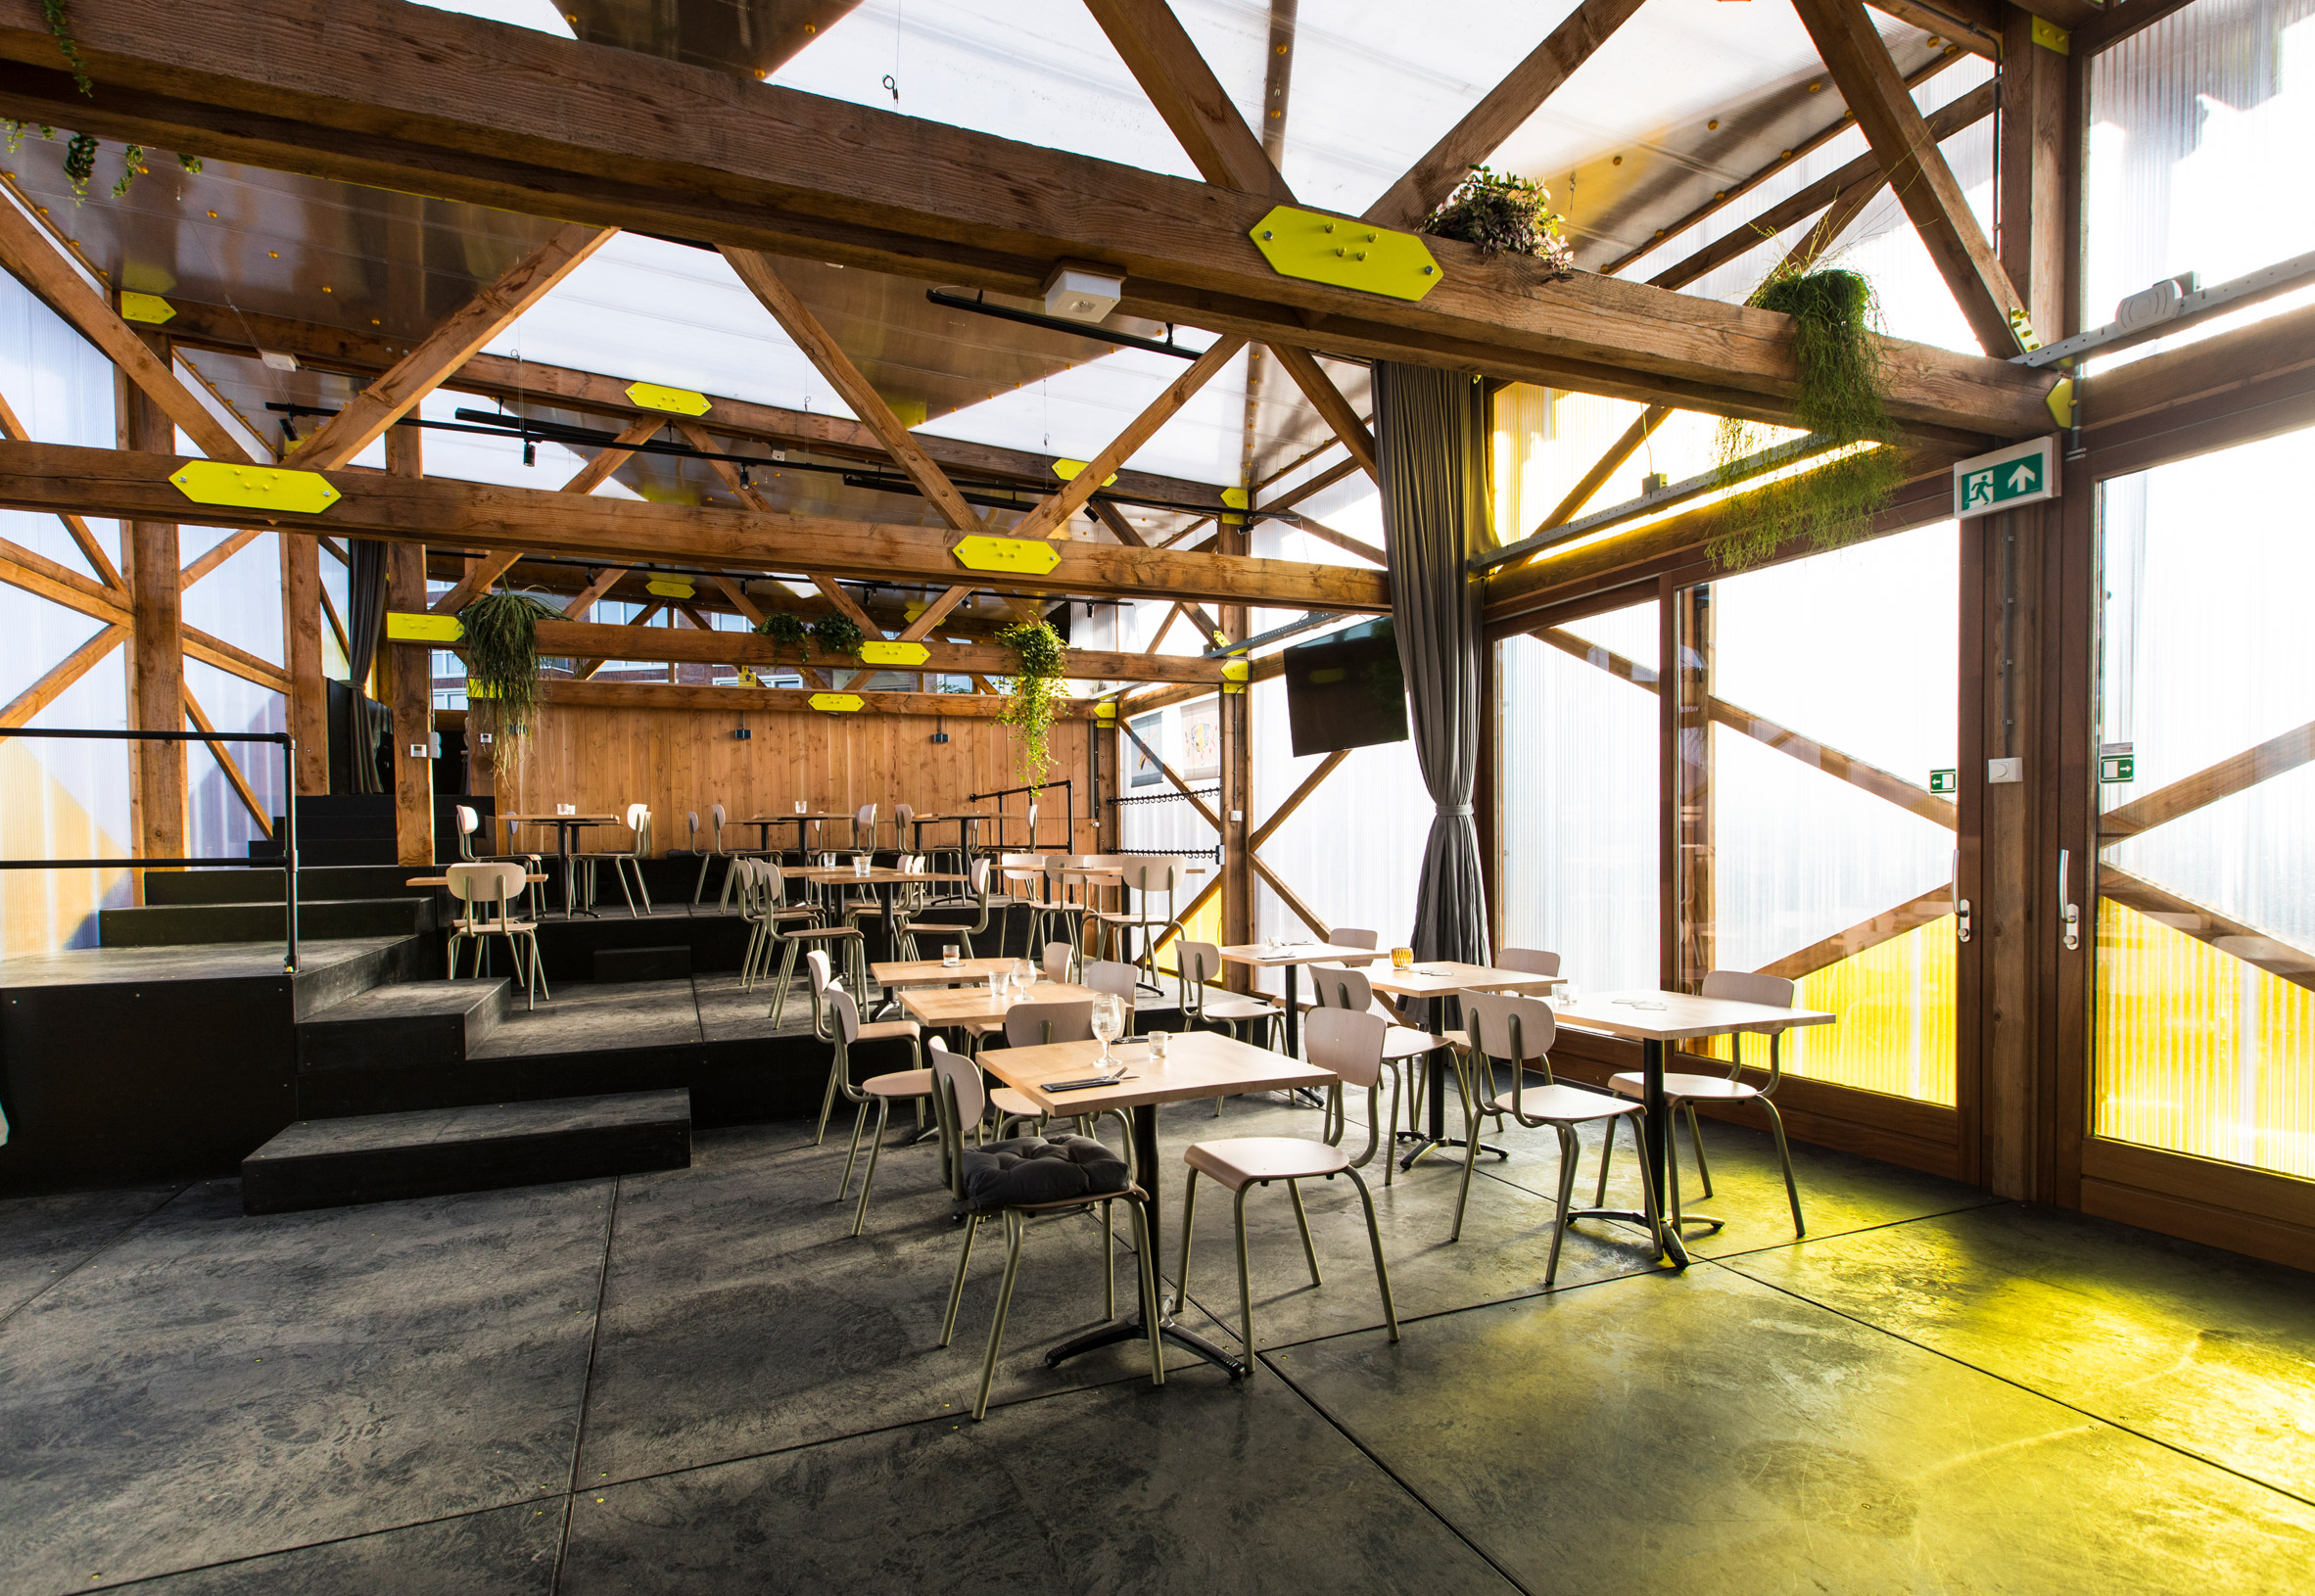 RAUM temporary restaurant pavilion by Overtreders W in Utrecht